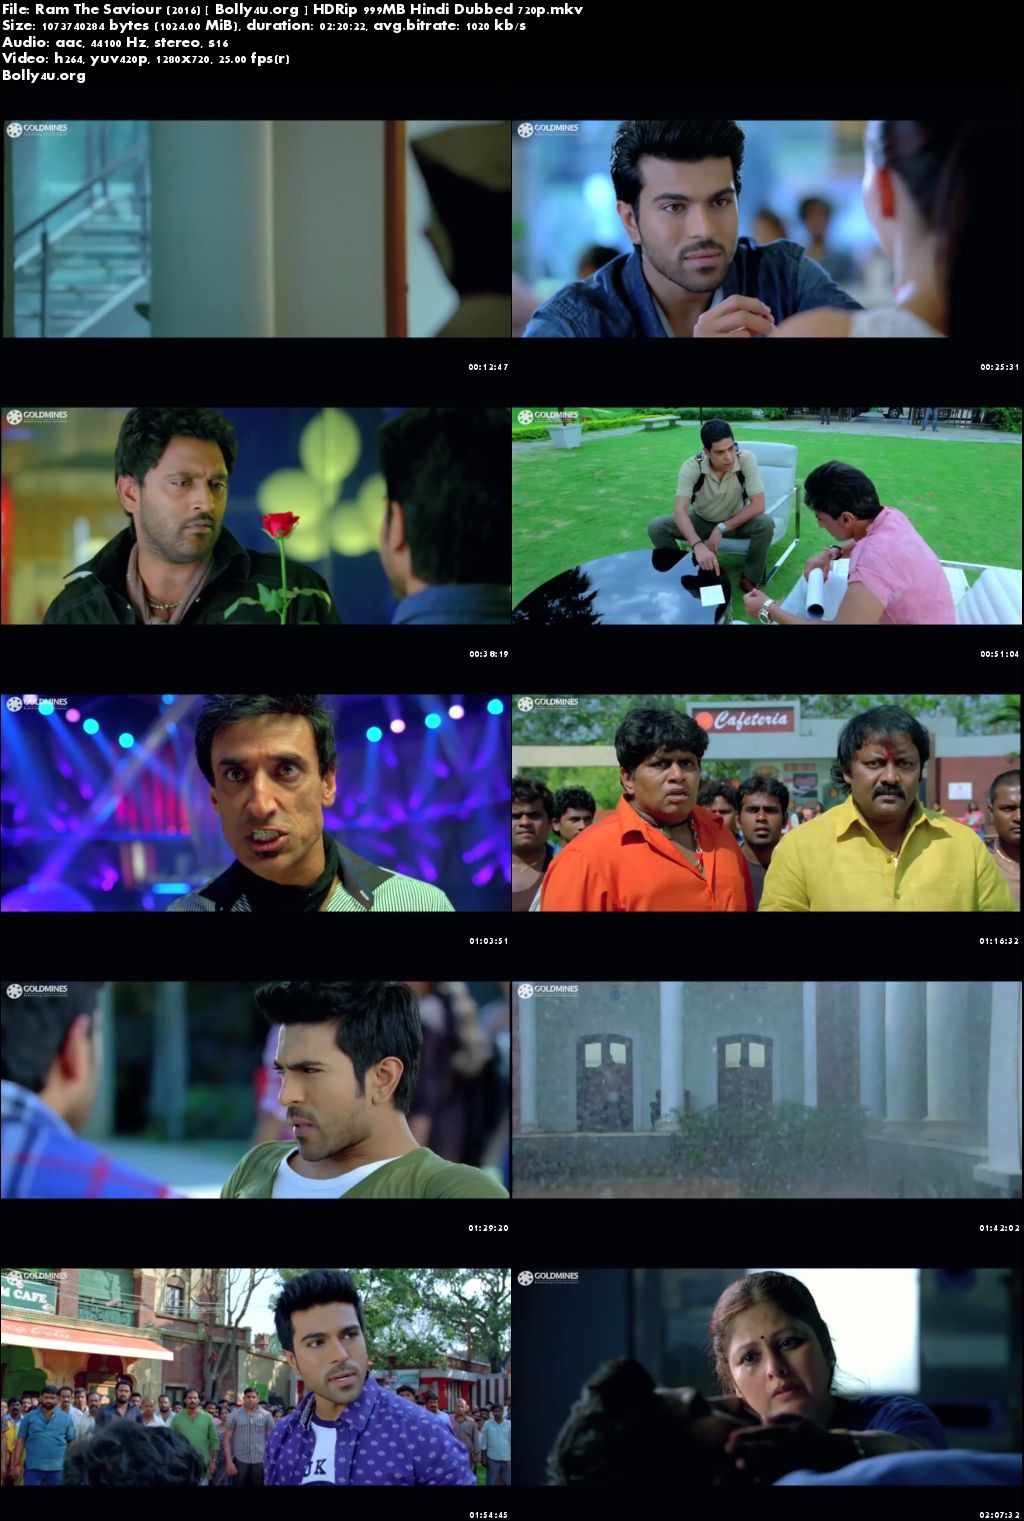 Ram The Saviour 2016 HDRip 400MB Hindi Dubbed 480p Download